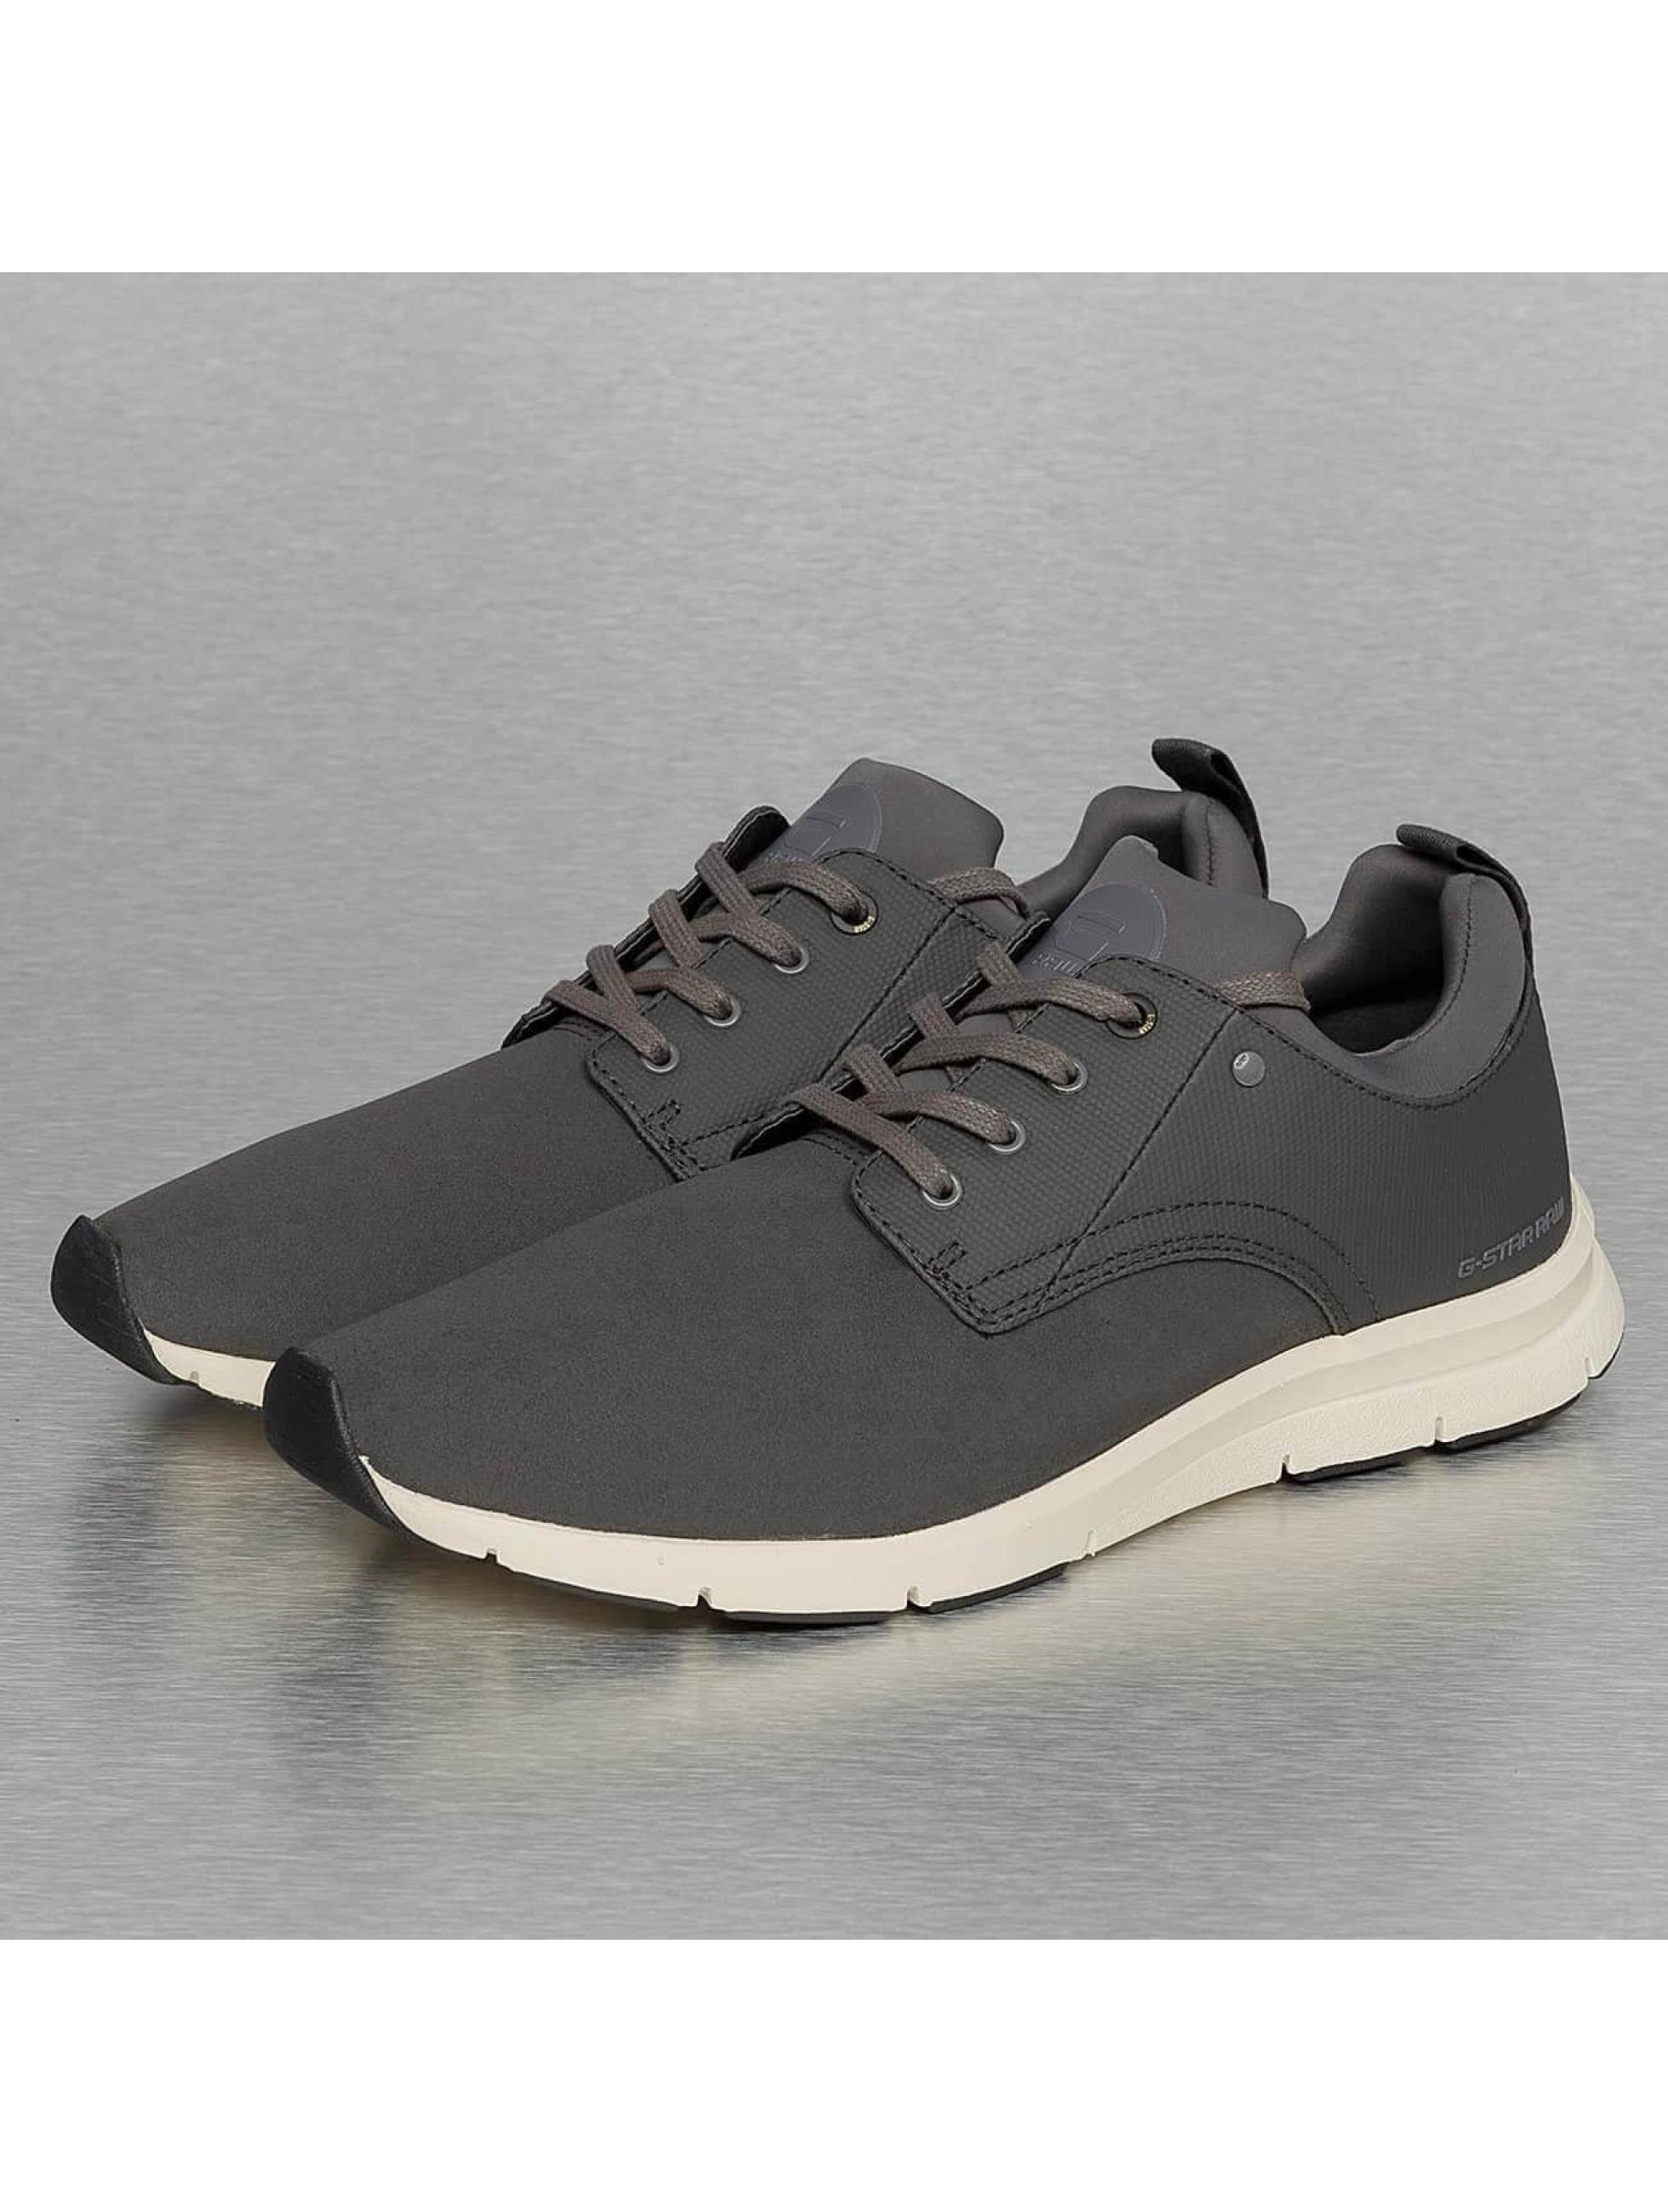 G-Star Footwear Sneaker Aver grau